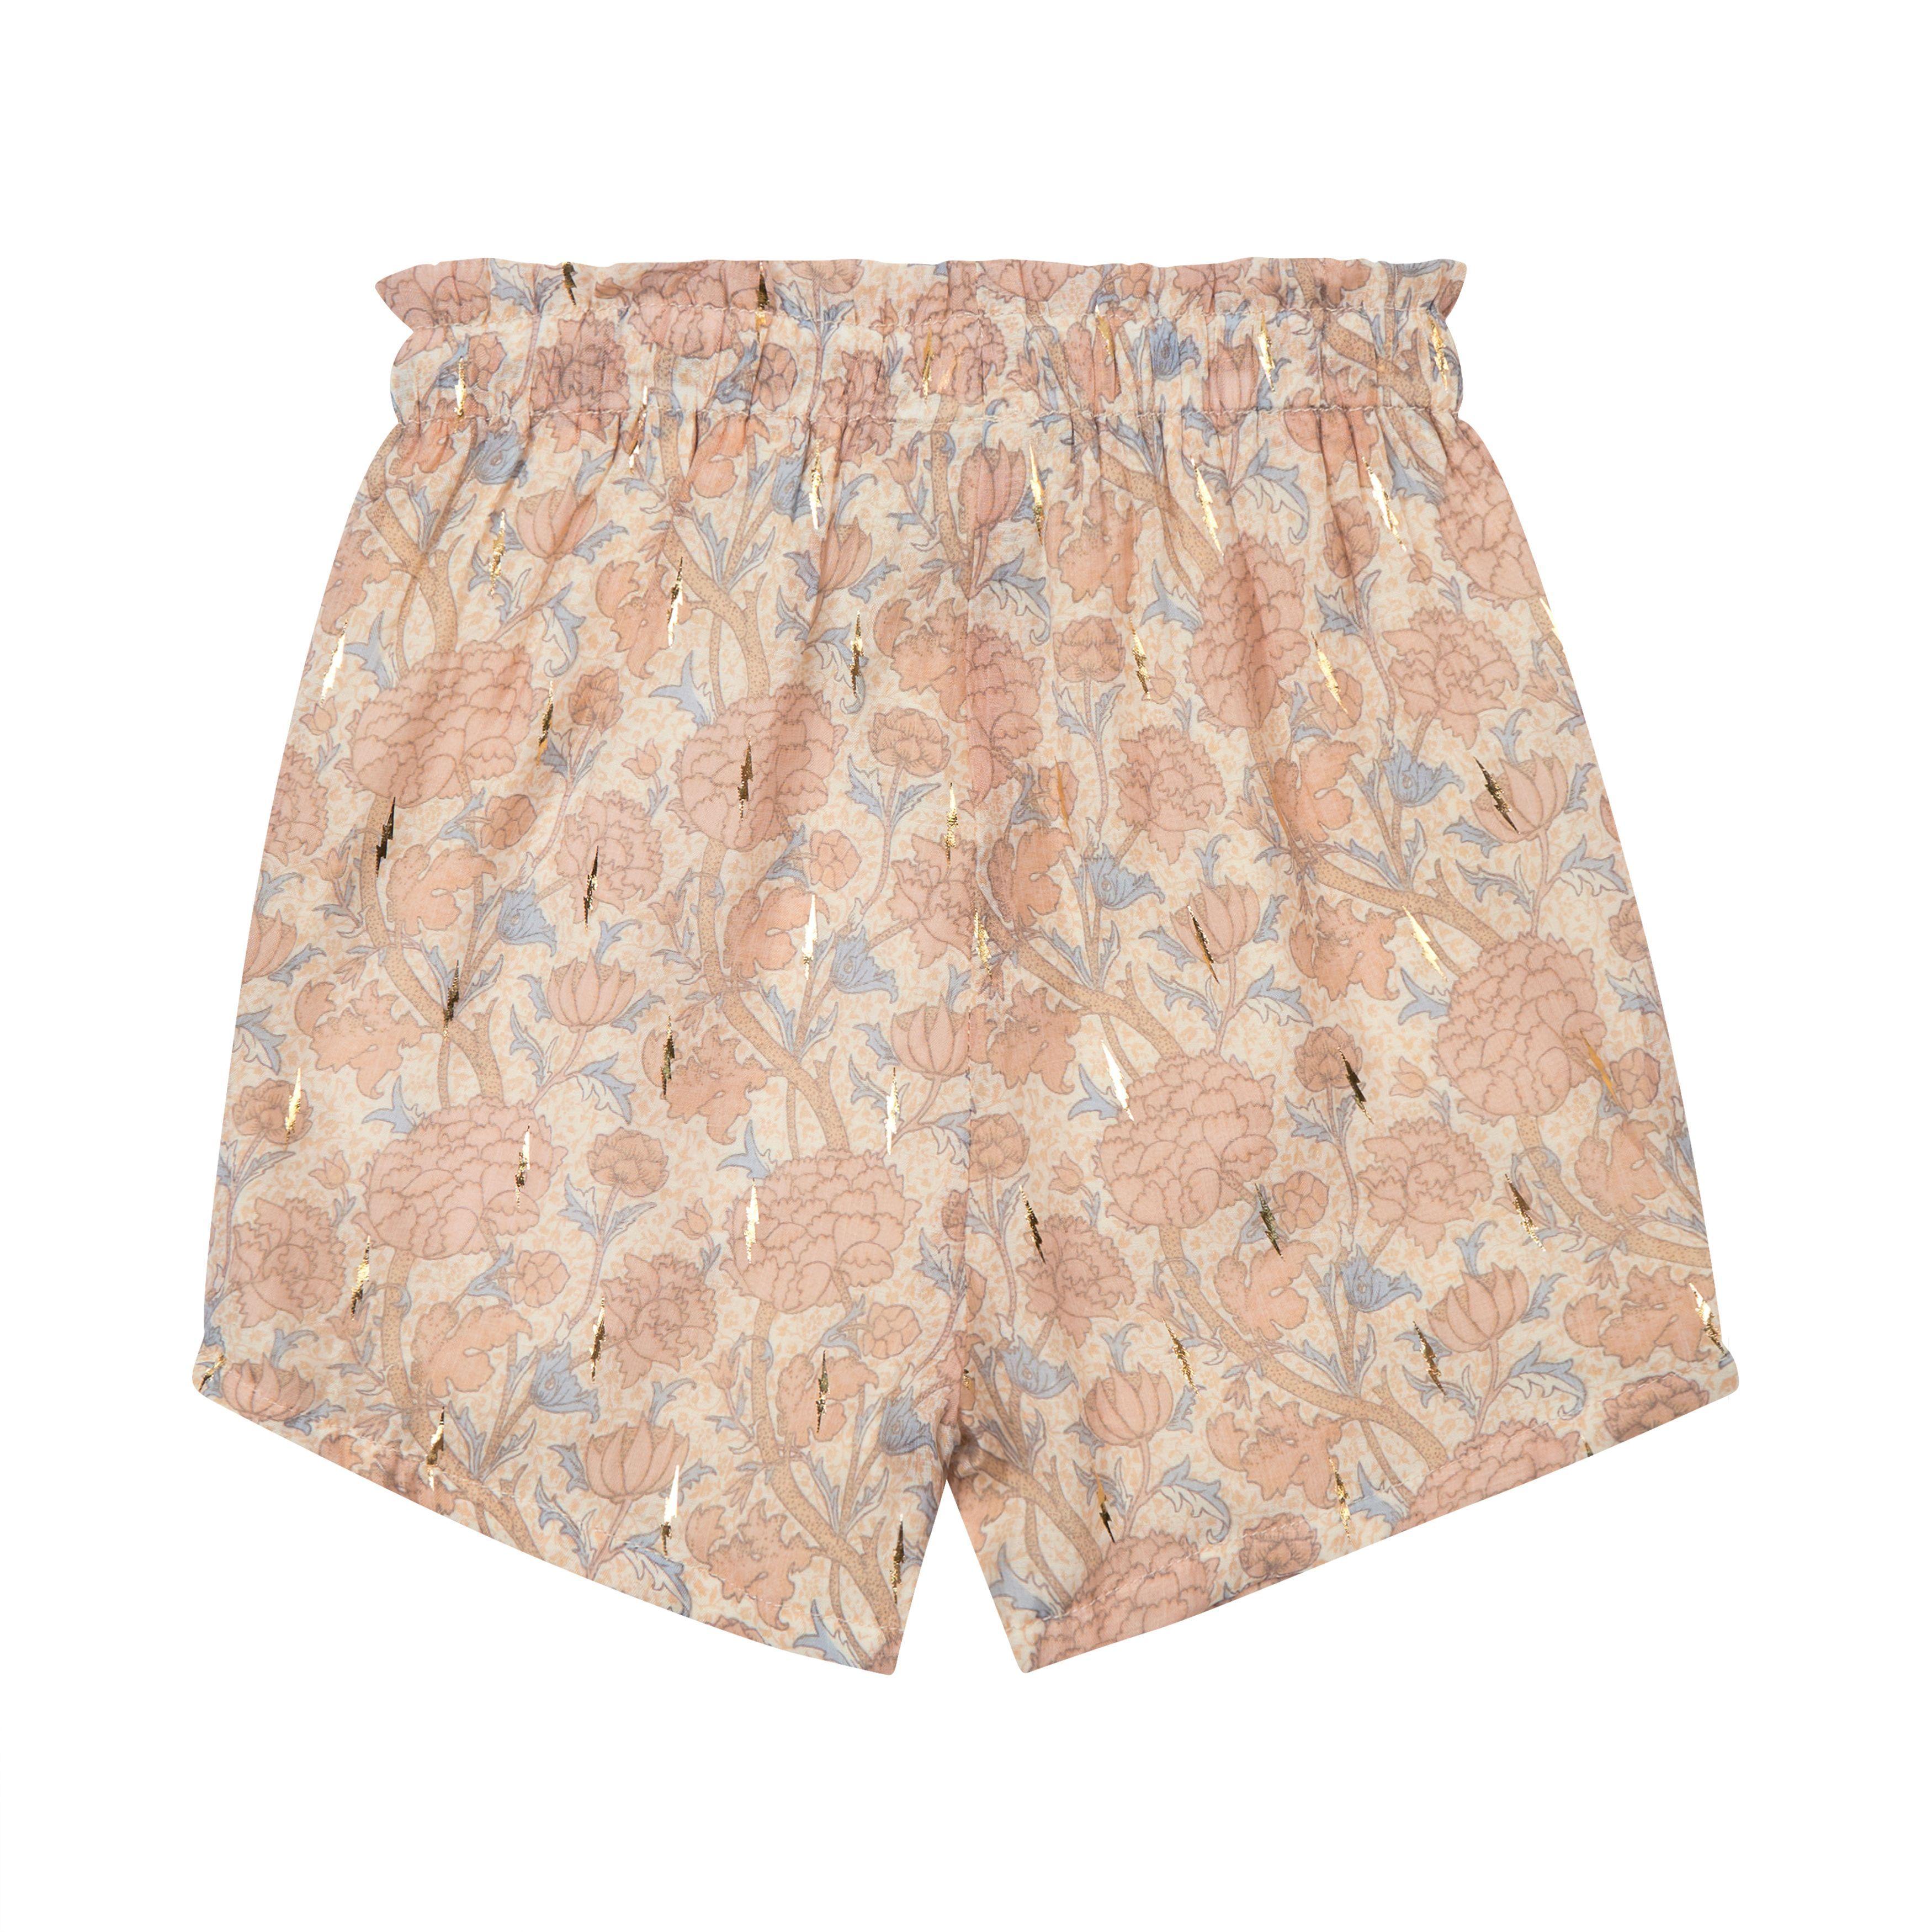 Petit by Sofie Schnoor P212626 shorts, light rose, 74